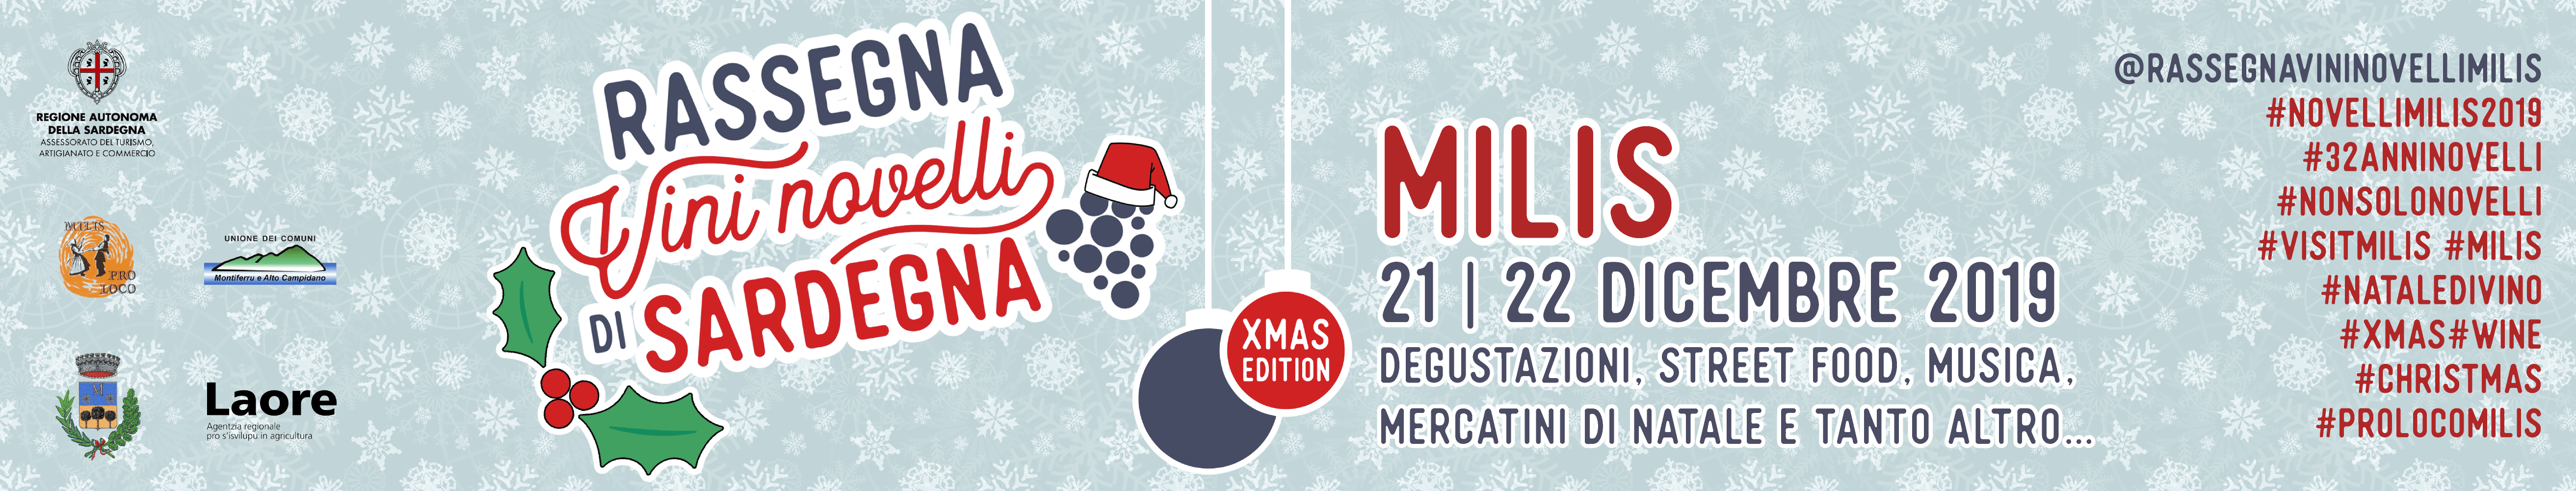 Vini Novelli Christmas edition